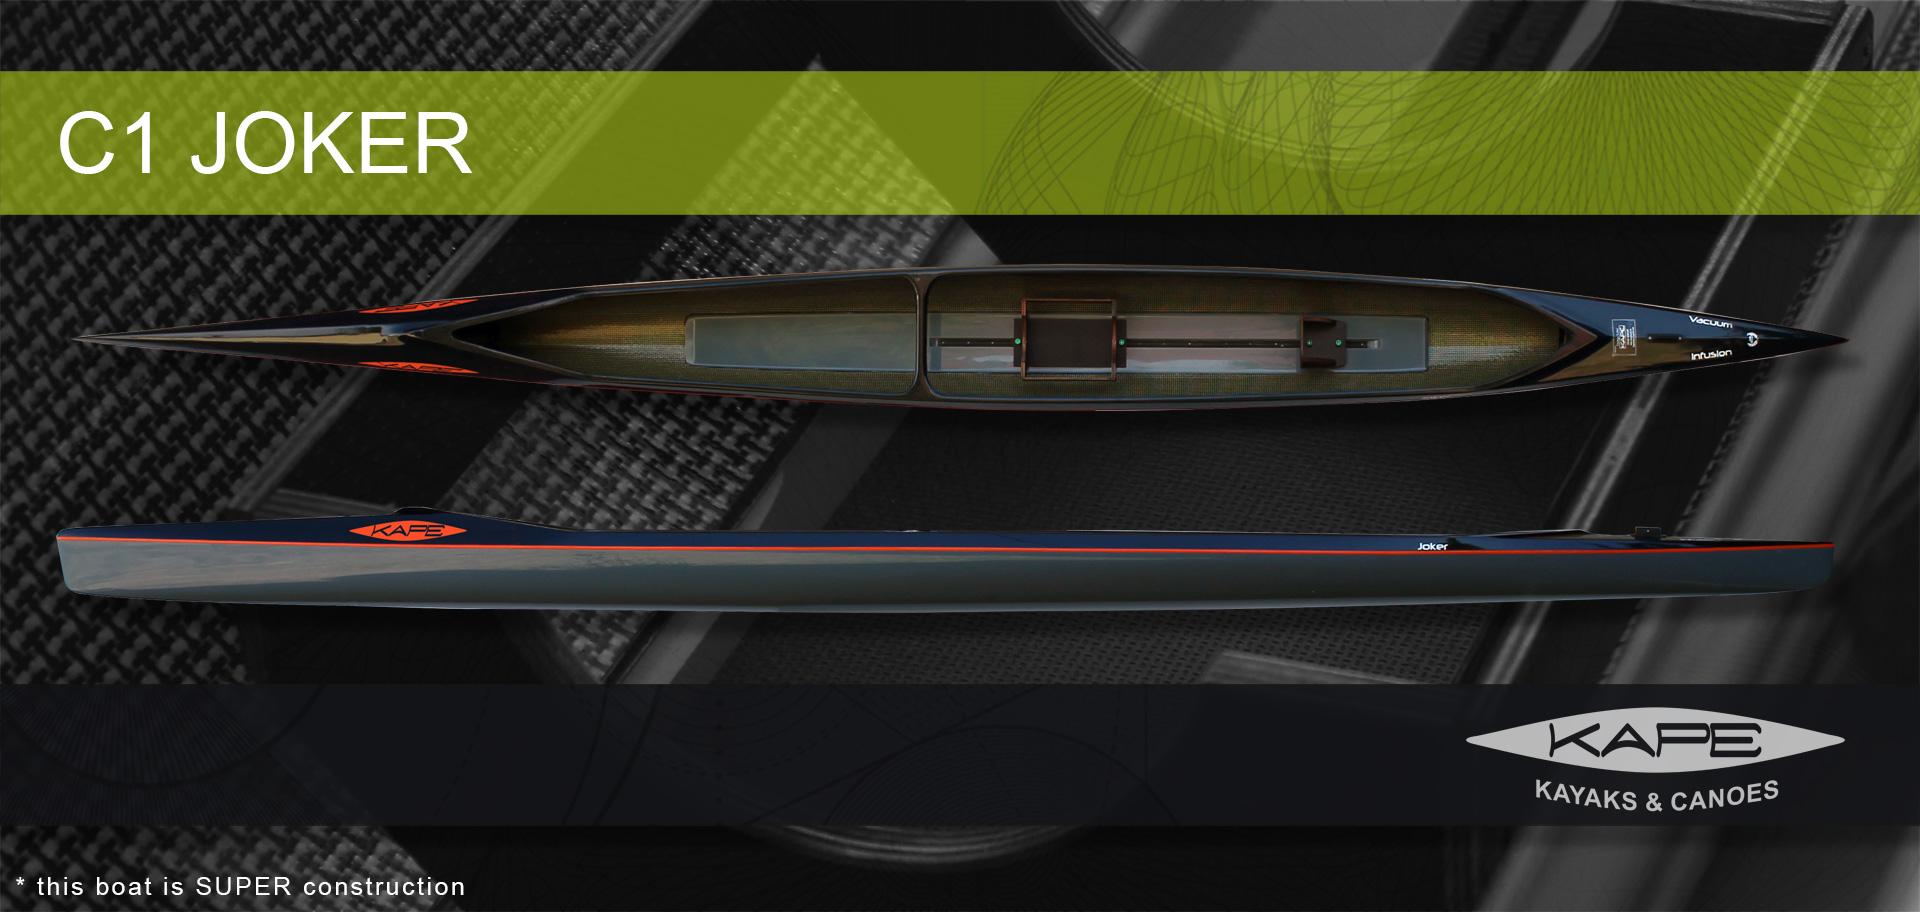 KAPE Canoes & Kayaks - C1 Joker